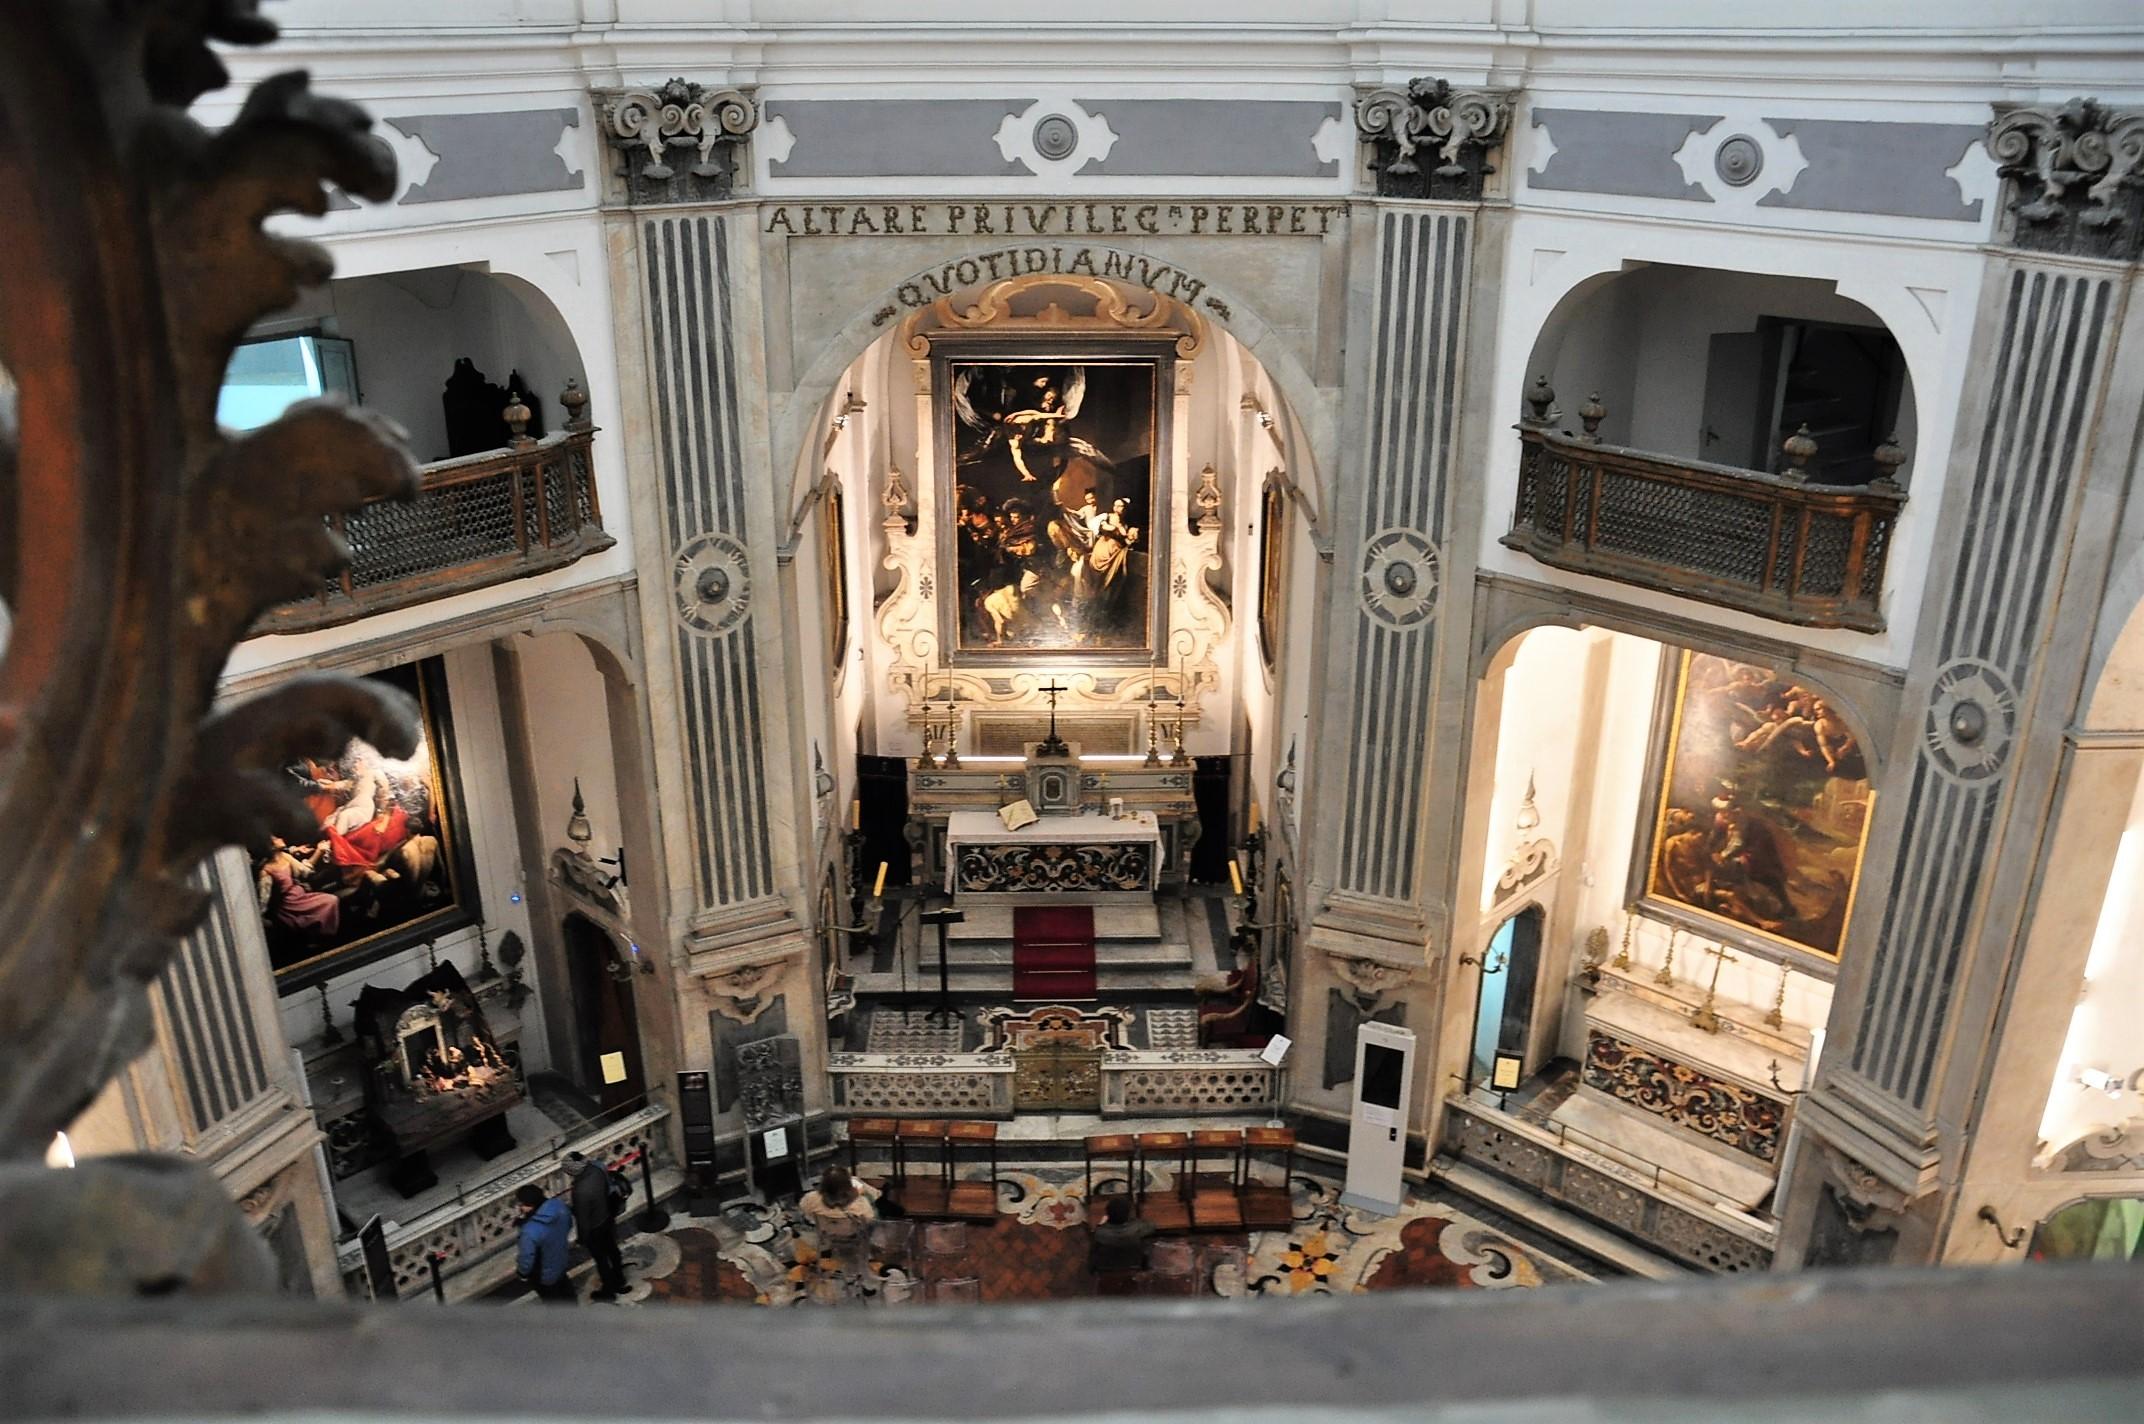 Caravaggio Pompeii visit Napoli - Neapel Tipps (44)